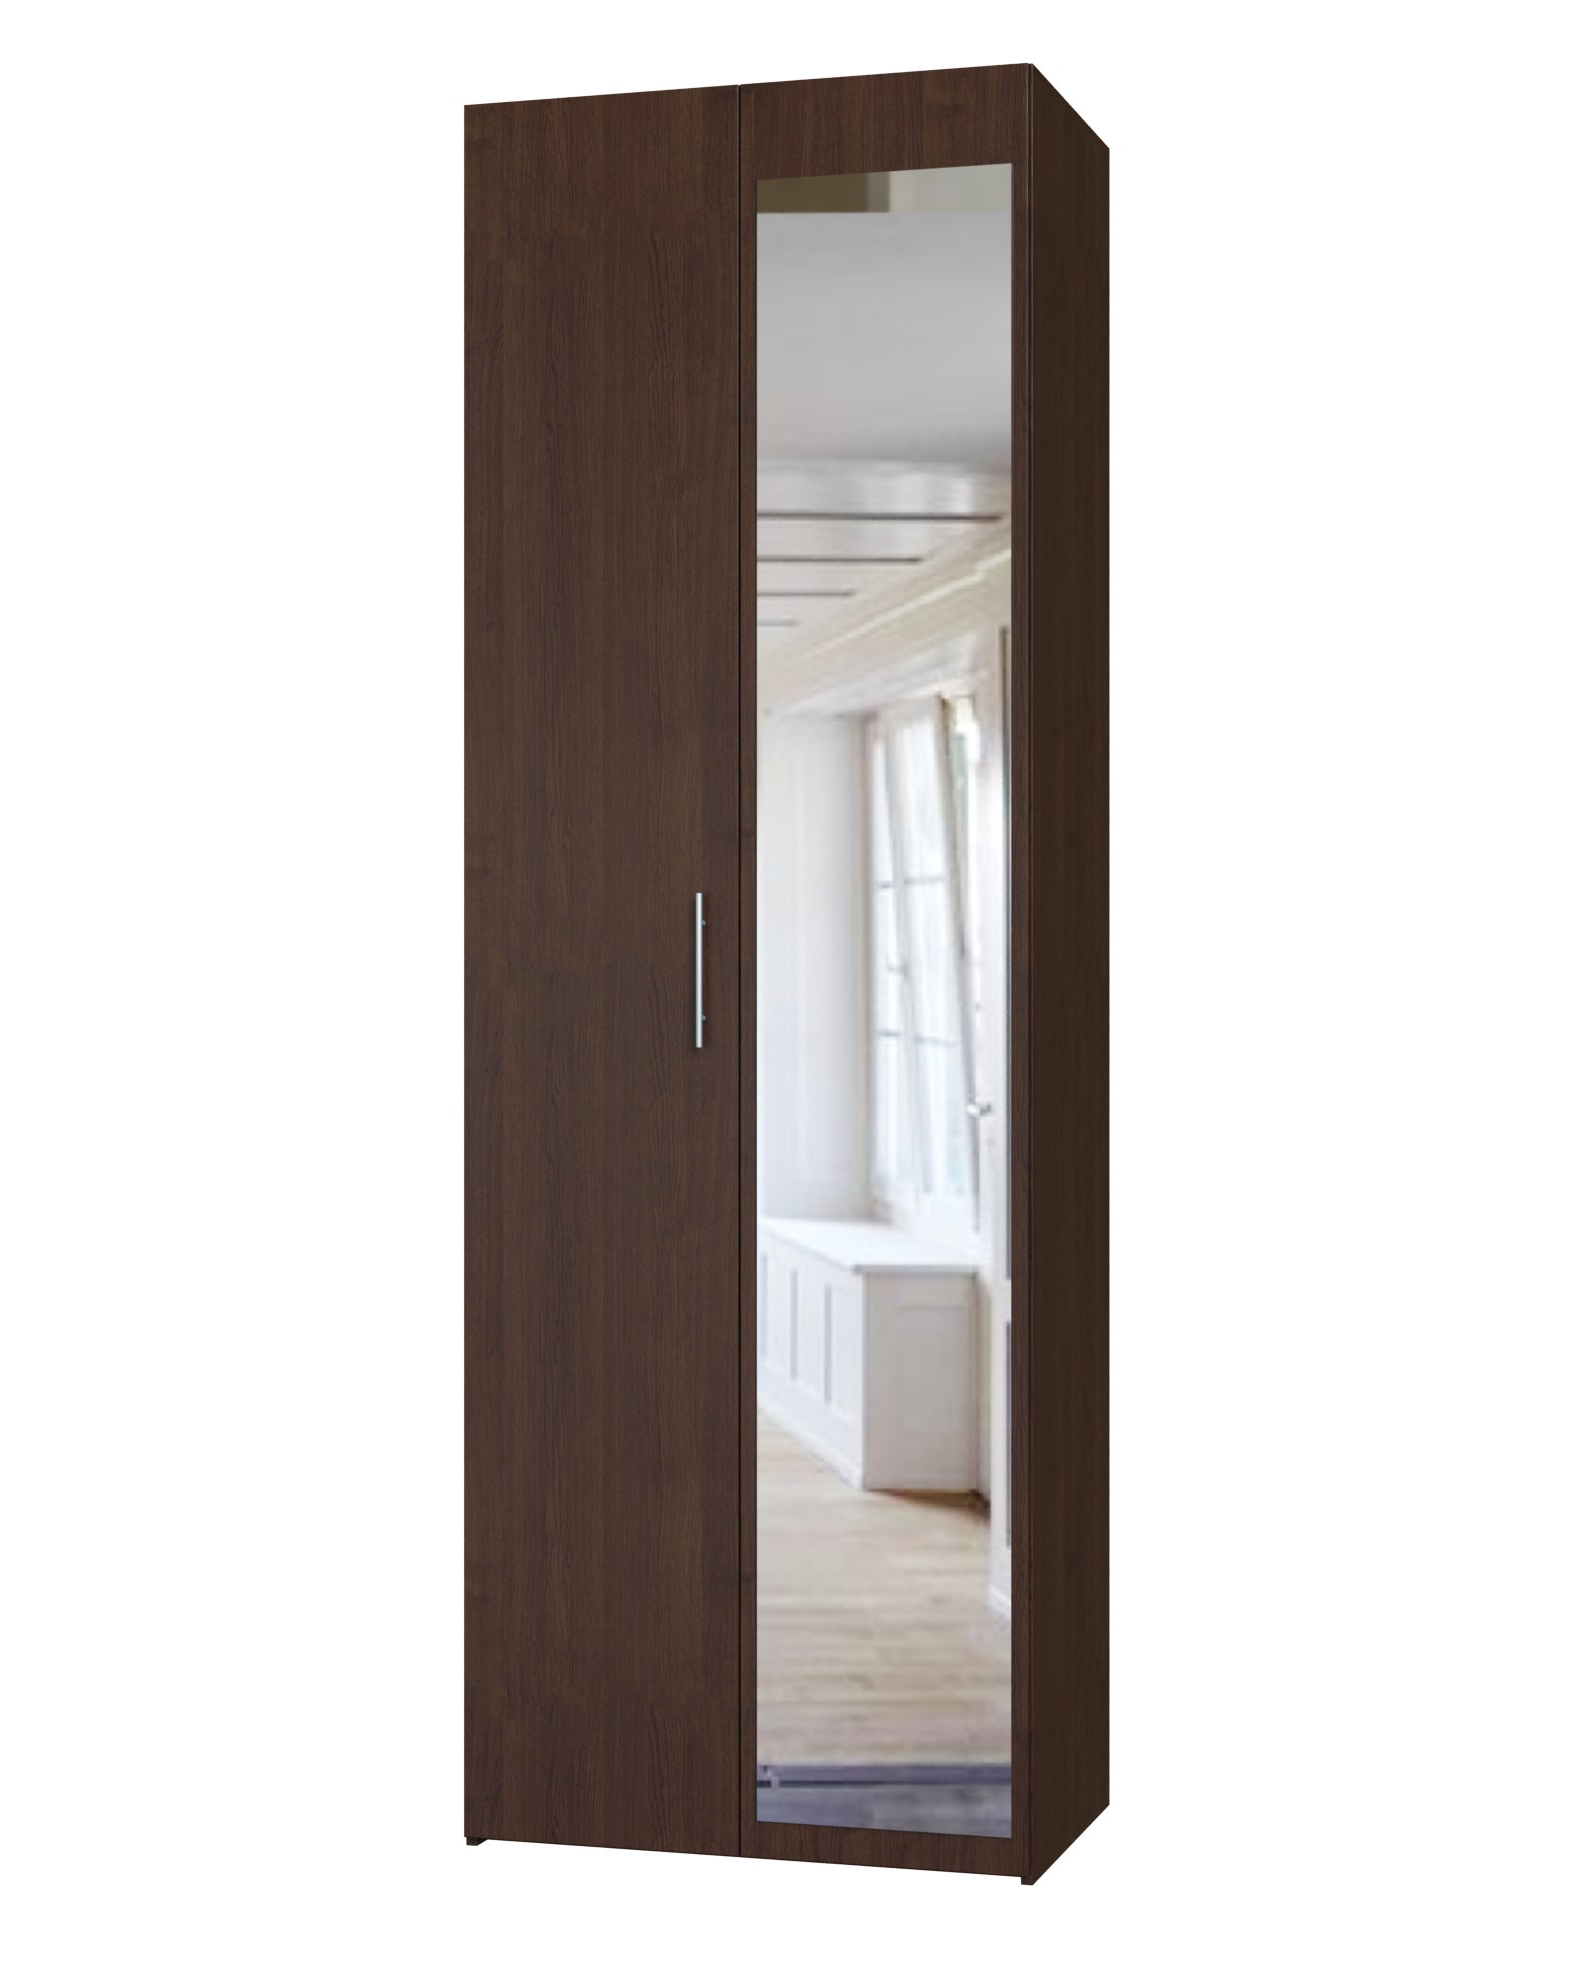 Шкаф-гармошка Палермо стенка палермо 12